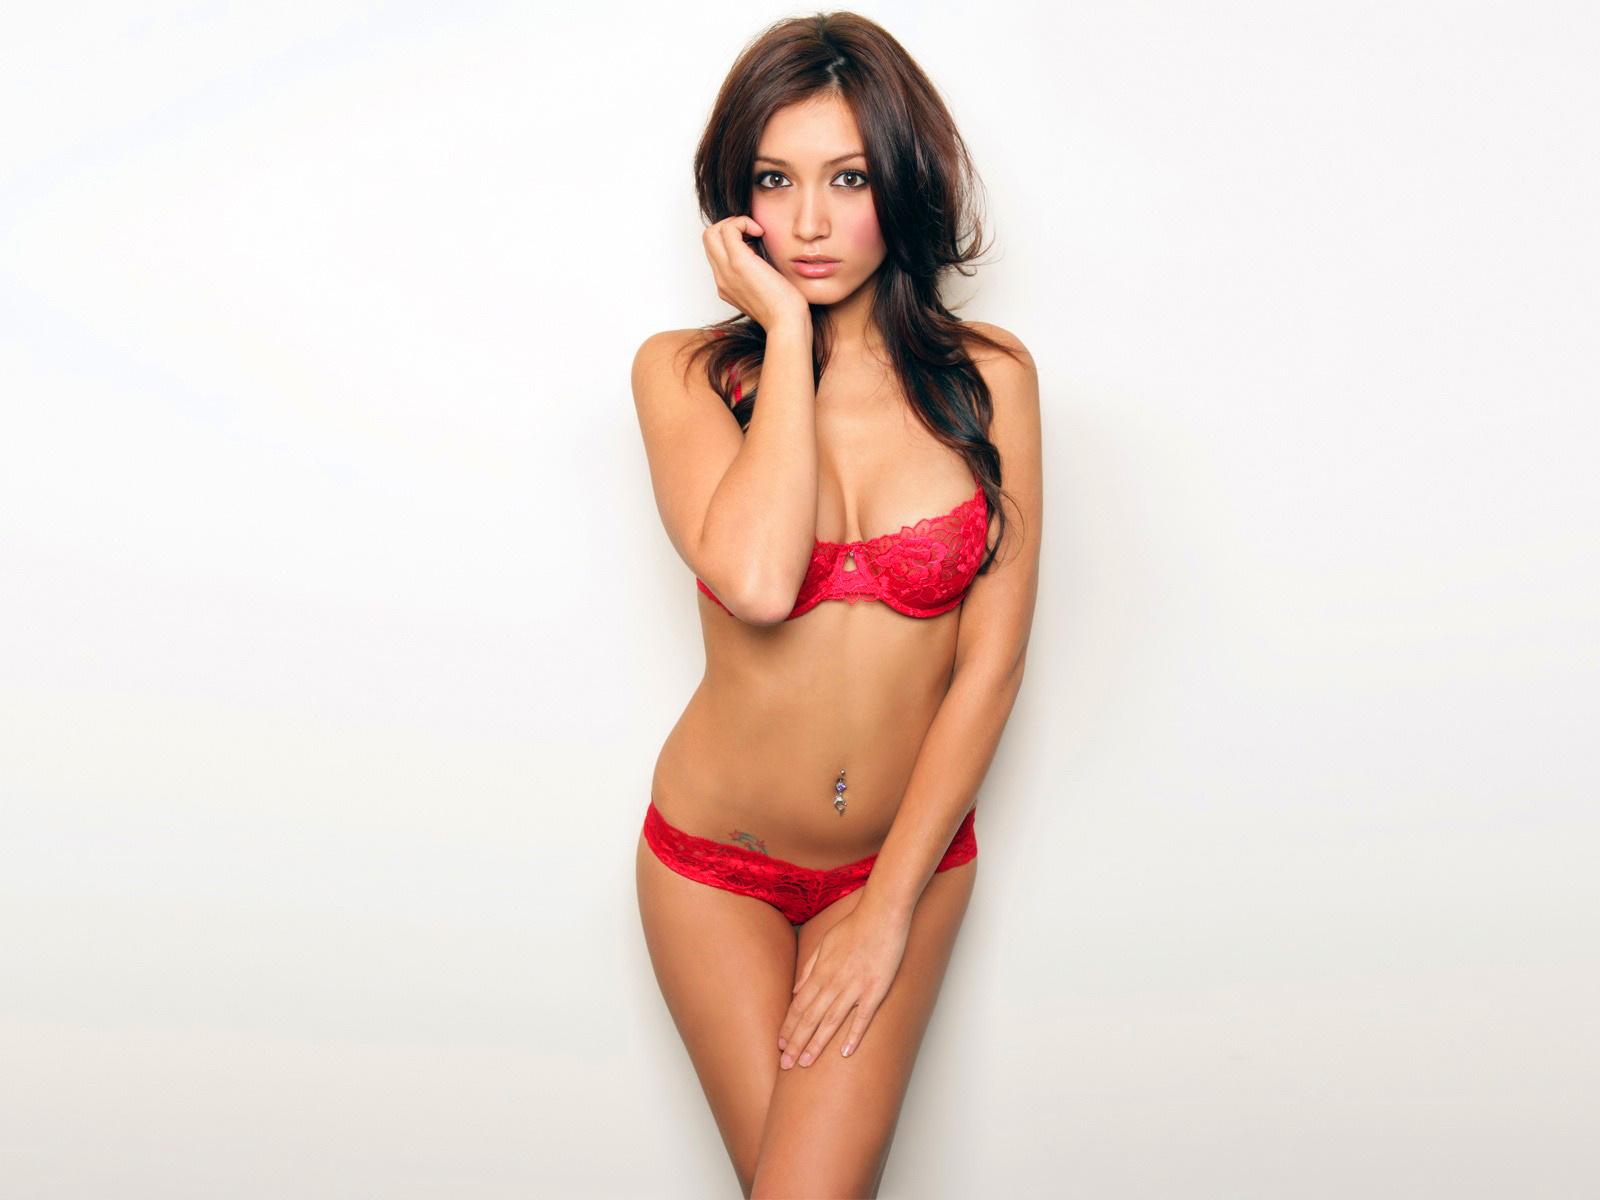 Ghost garl sex hd wallpaper free dawuload porn ameteur girlfriend